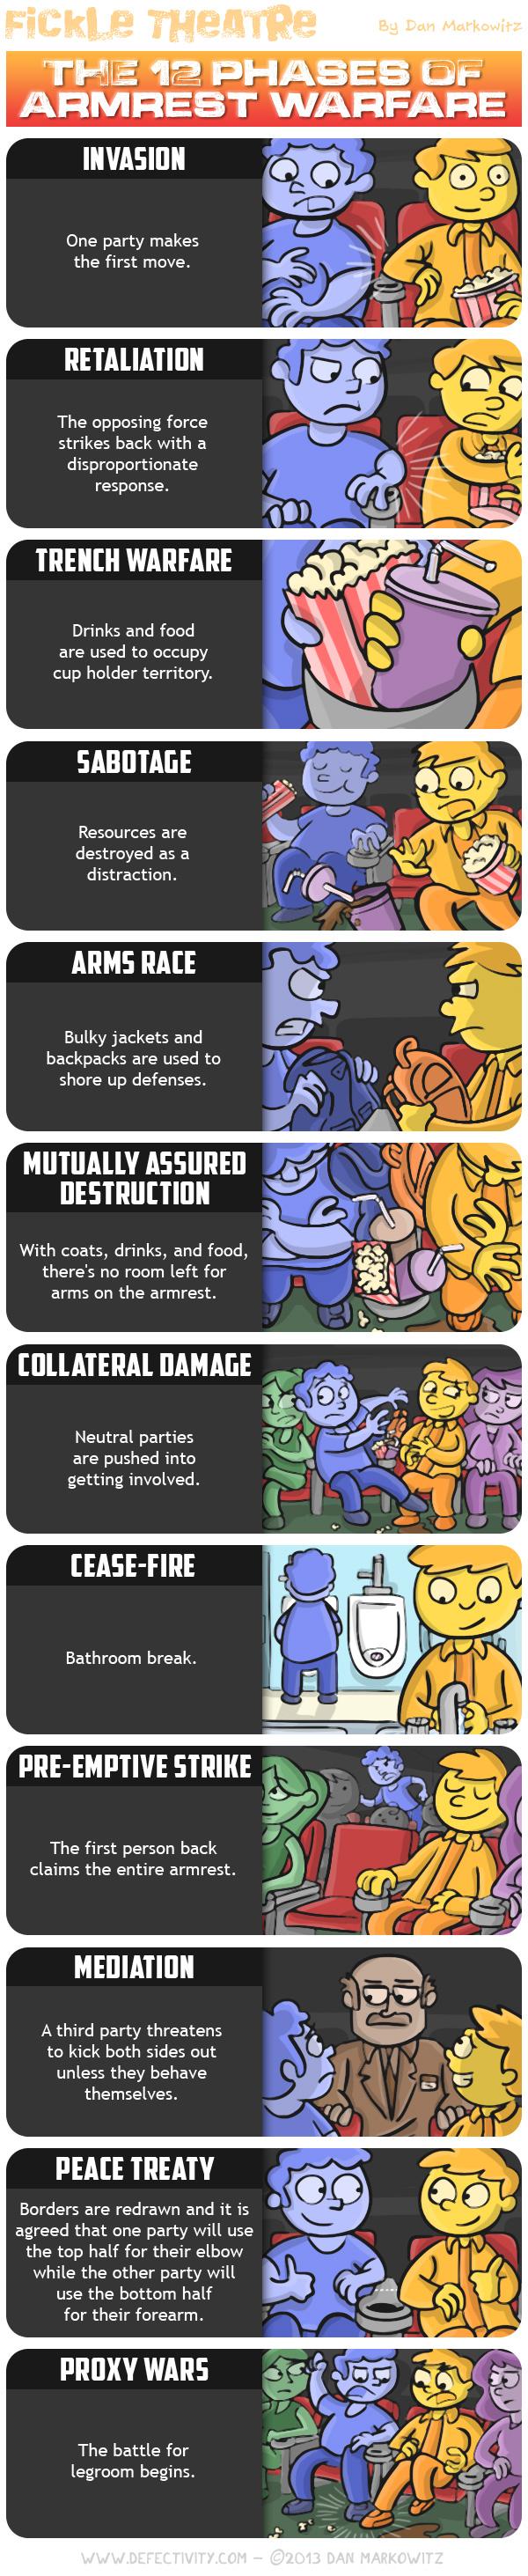 12 Phases of Armrest Warfare.jpg